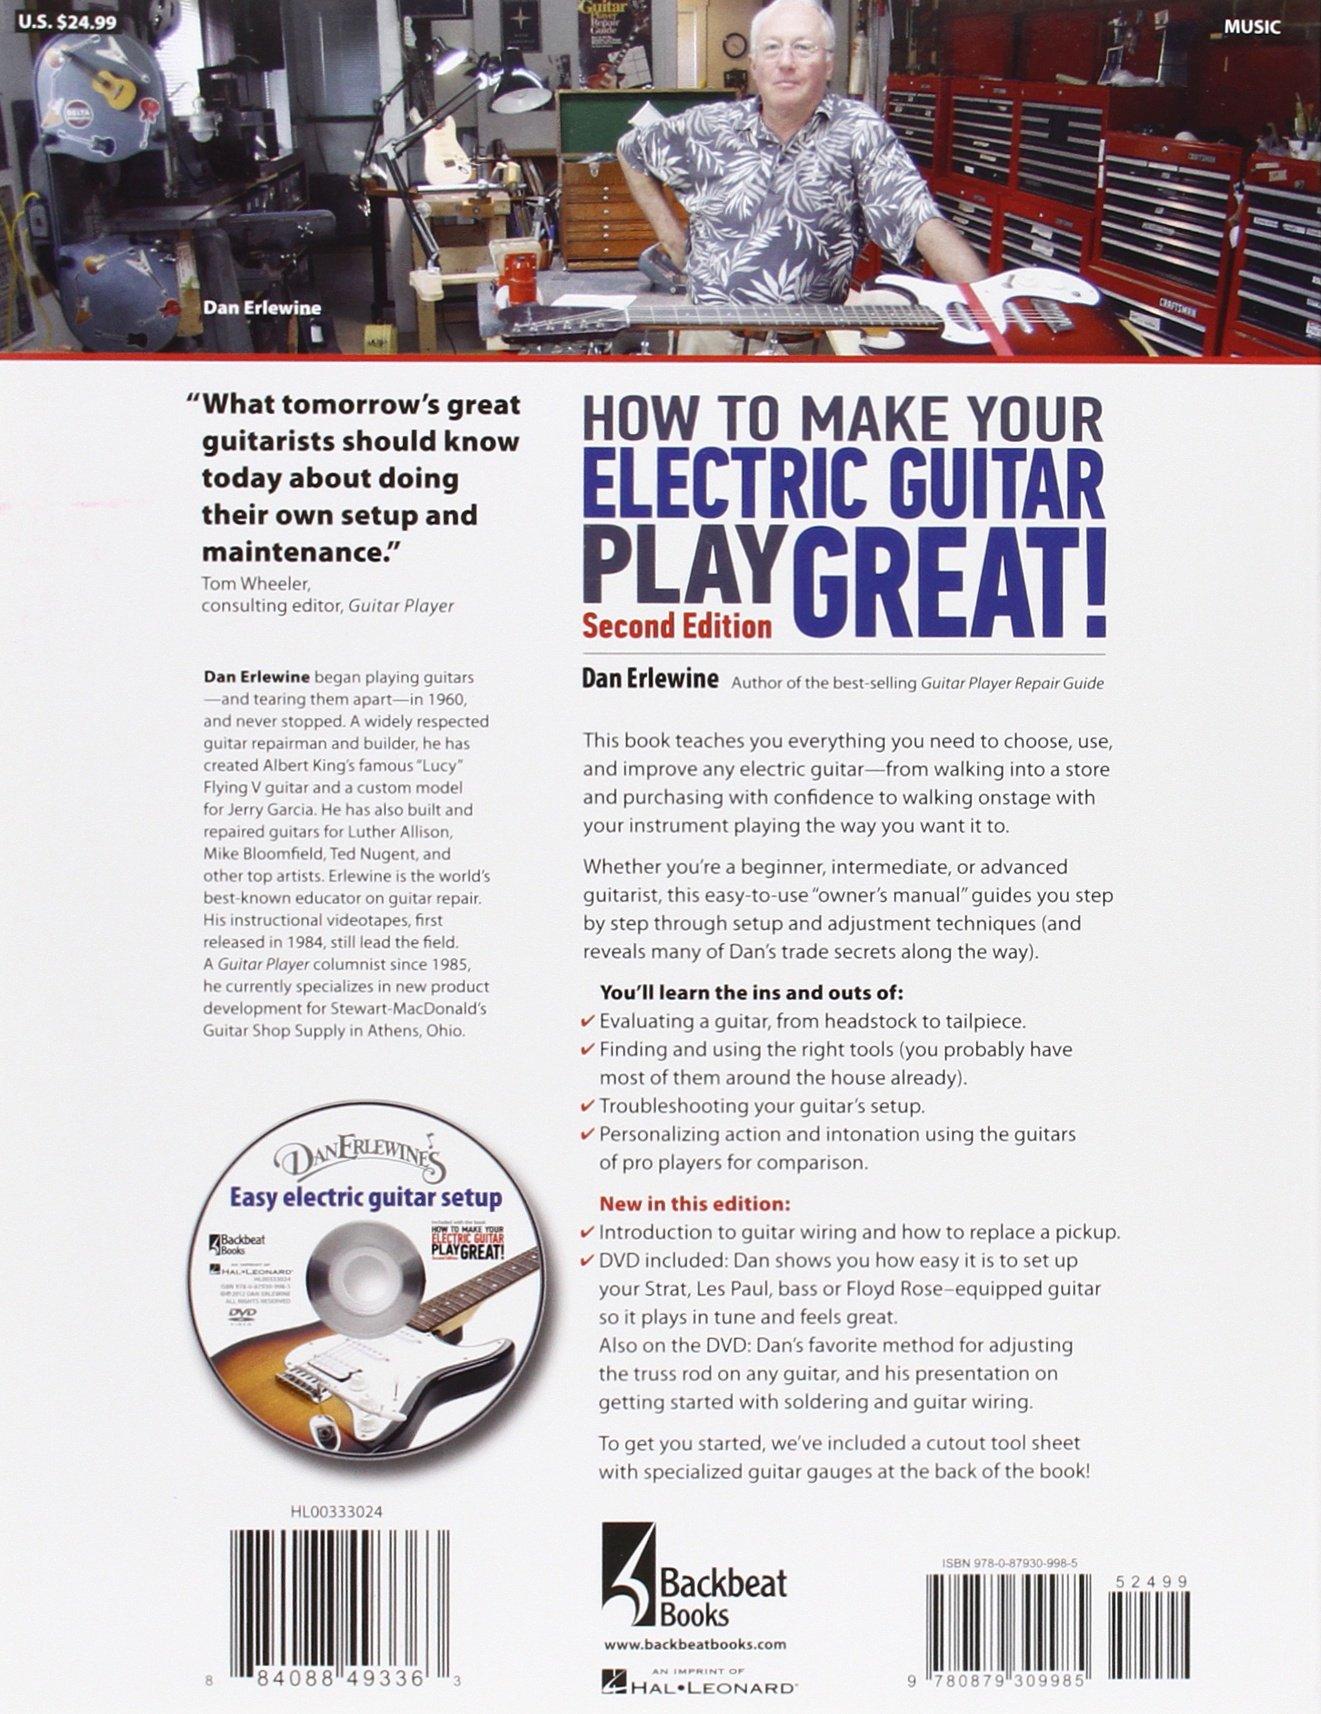 how to make your electric guitar play great second edition dan rh amazon com Electric Guitar Repair Do Yourself Guitar Repair